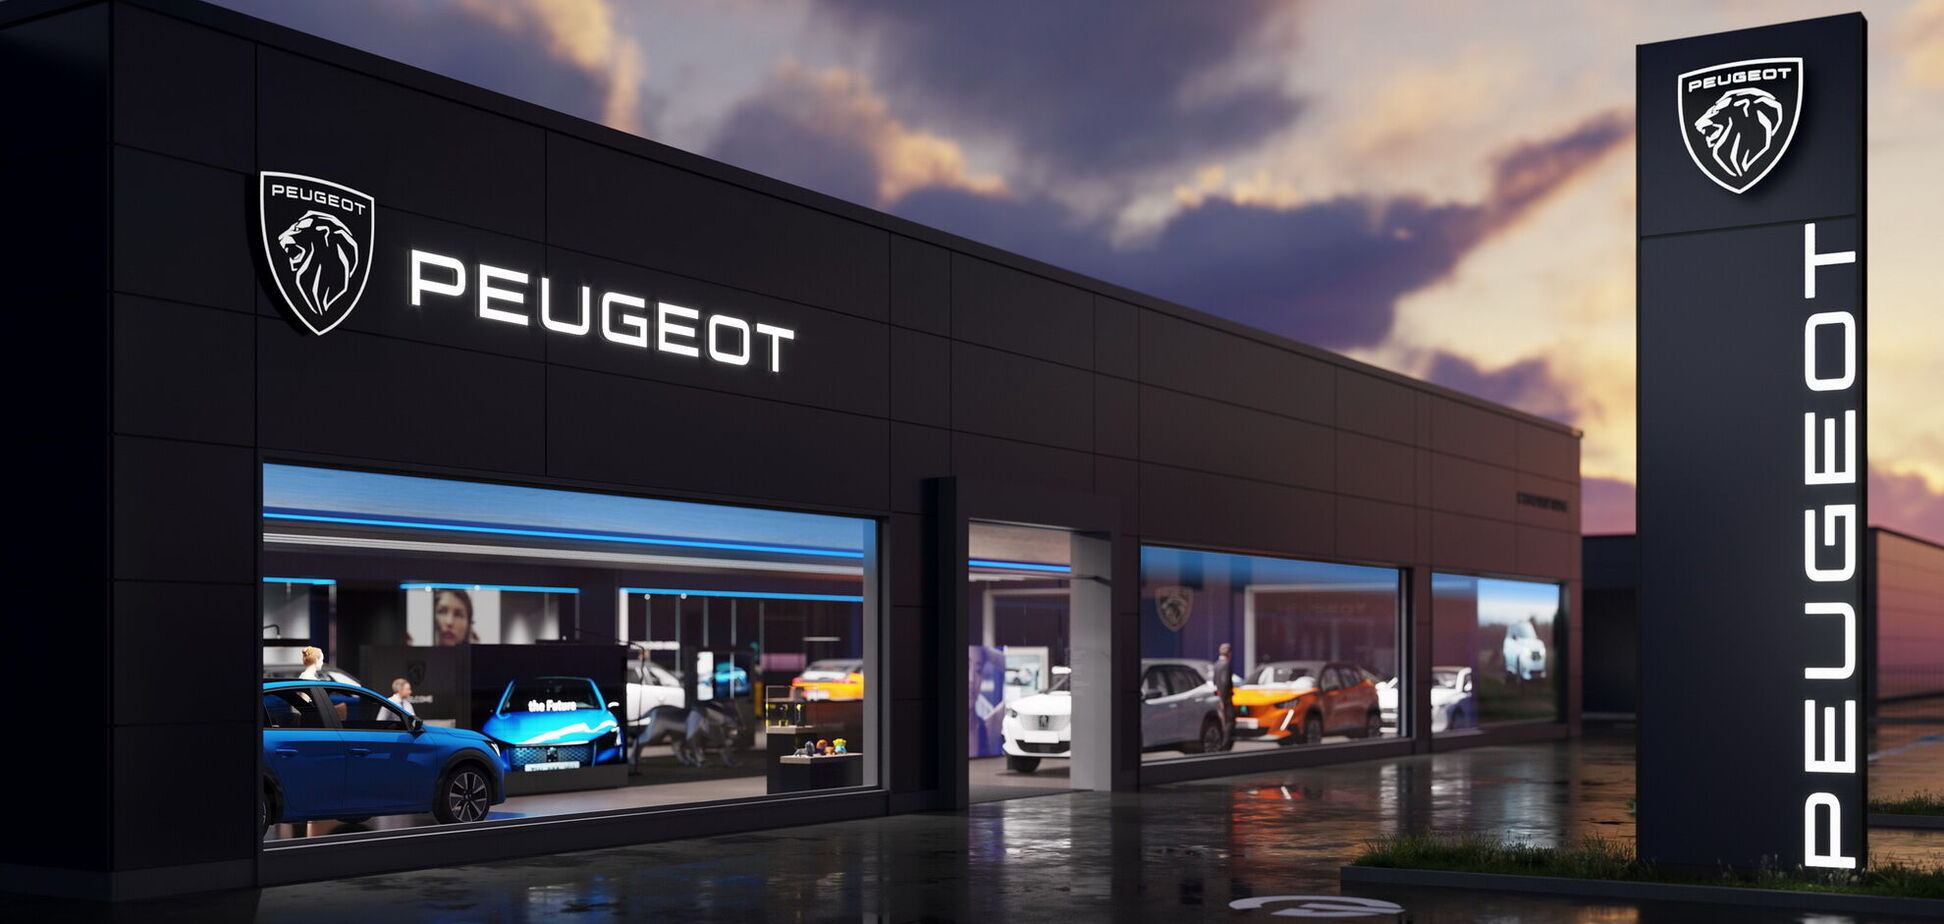 Peugeot провела ребрендинг та змінила емблему